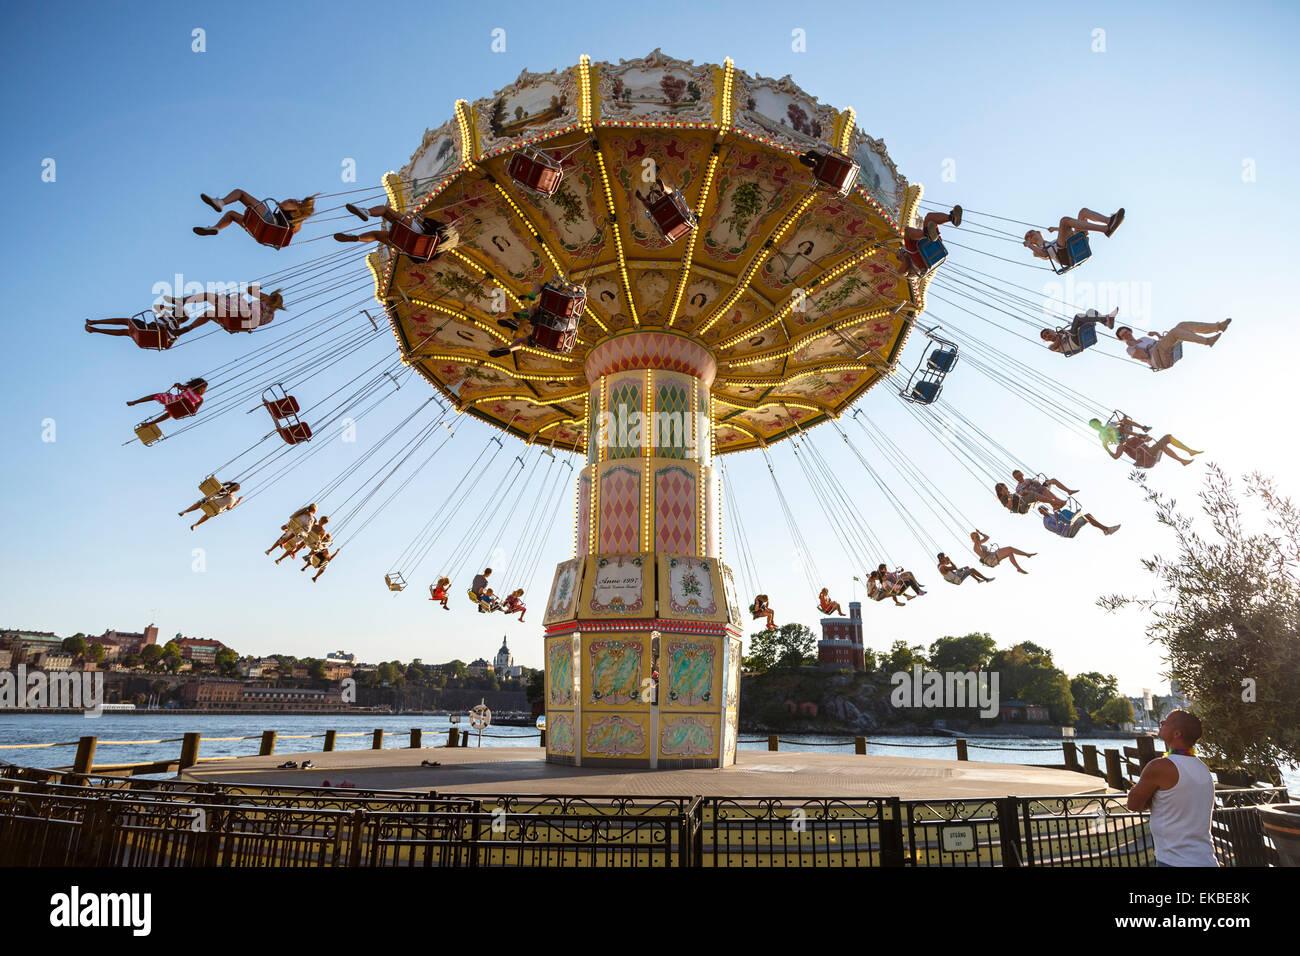 Grona Lund Amusement Park, Djurgarden, Stoccolma, Svezia, Scandinavia, Europa Immagini Stock